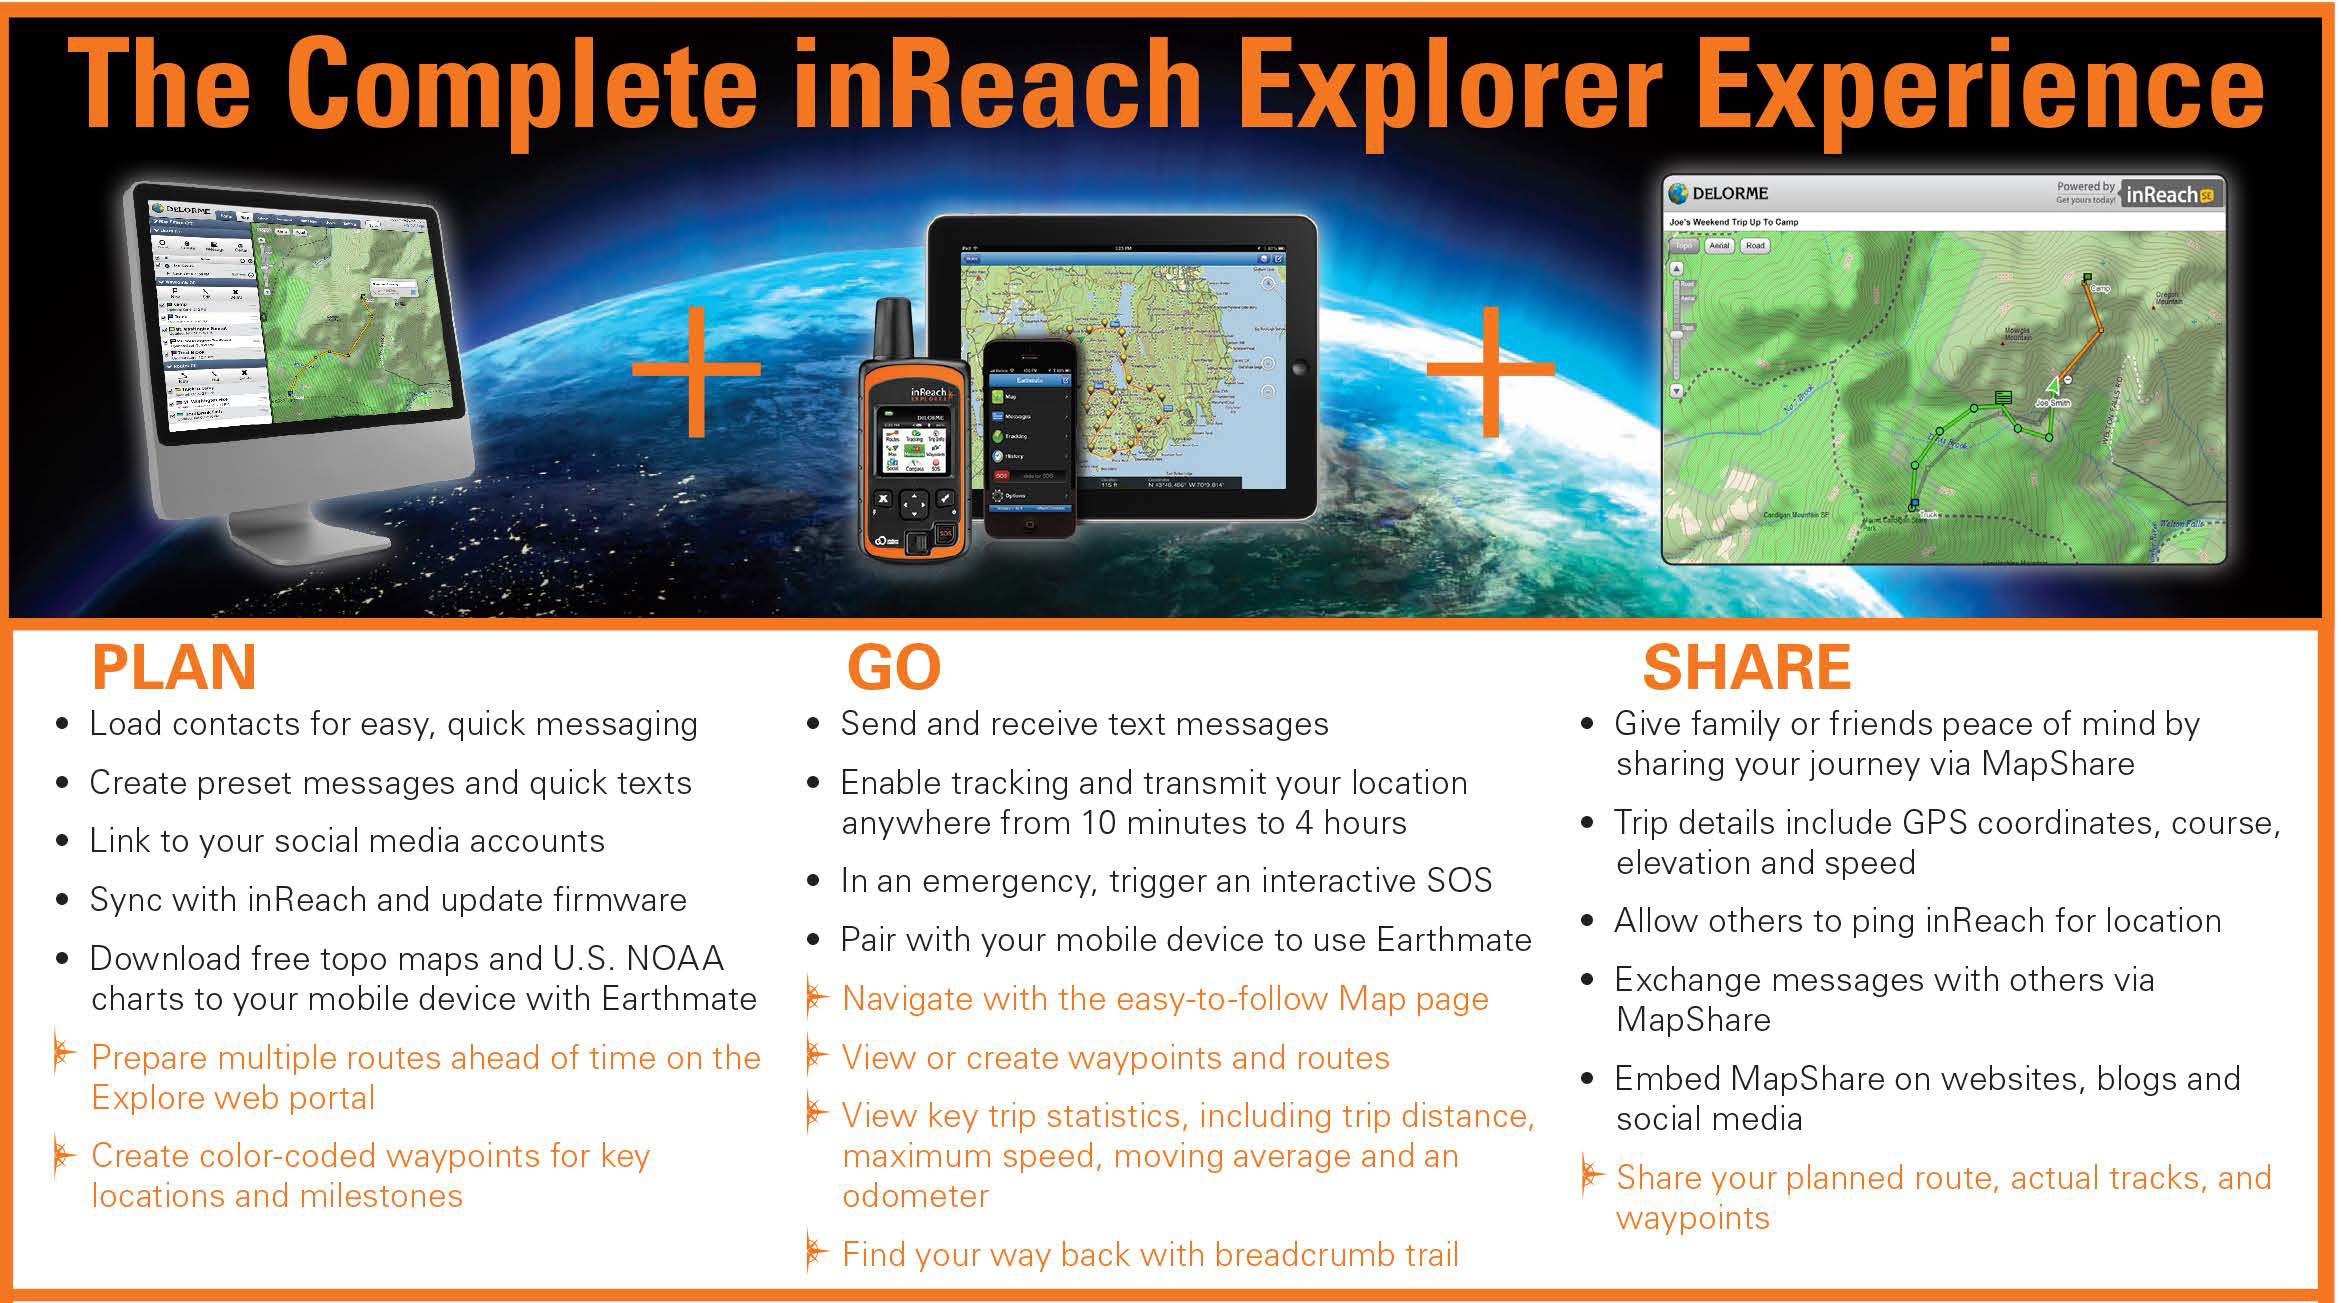 The Complete inReach Explorer Experience